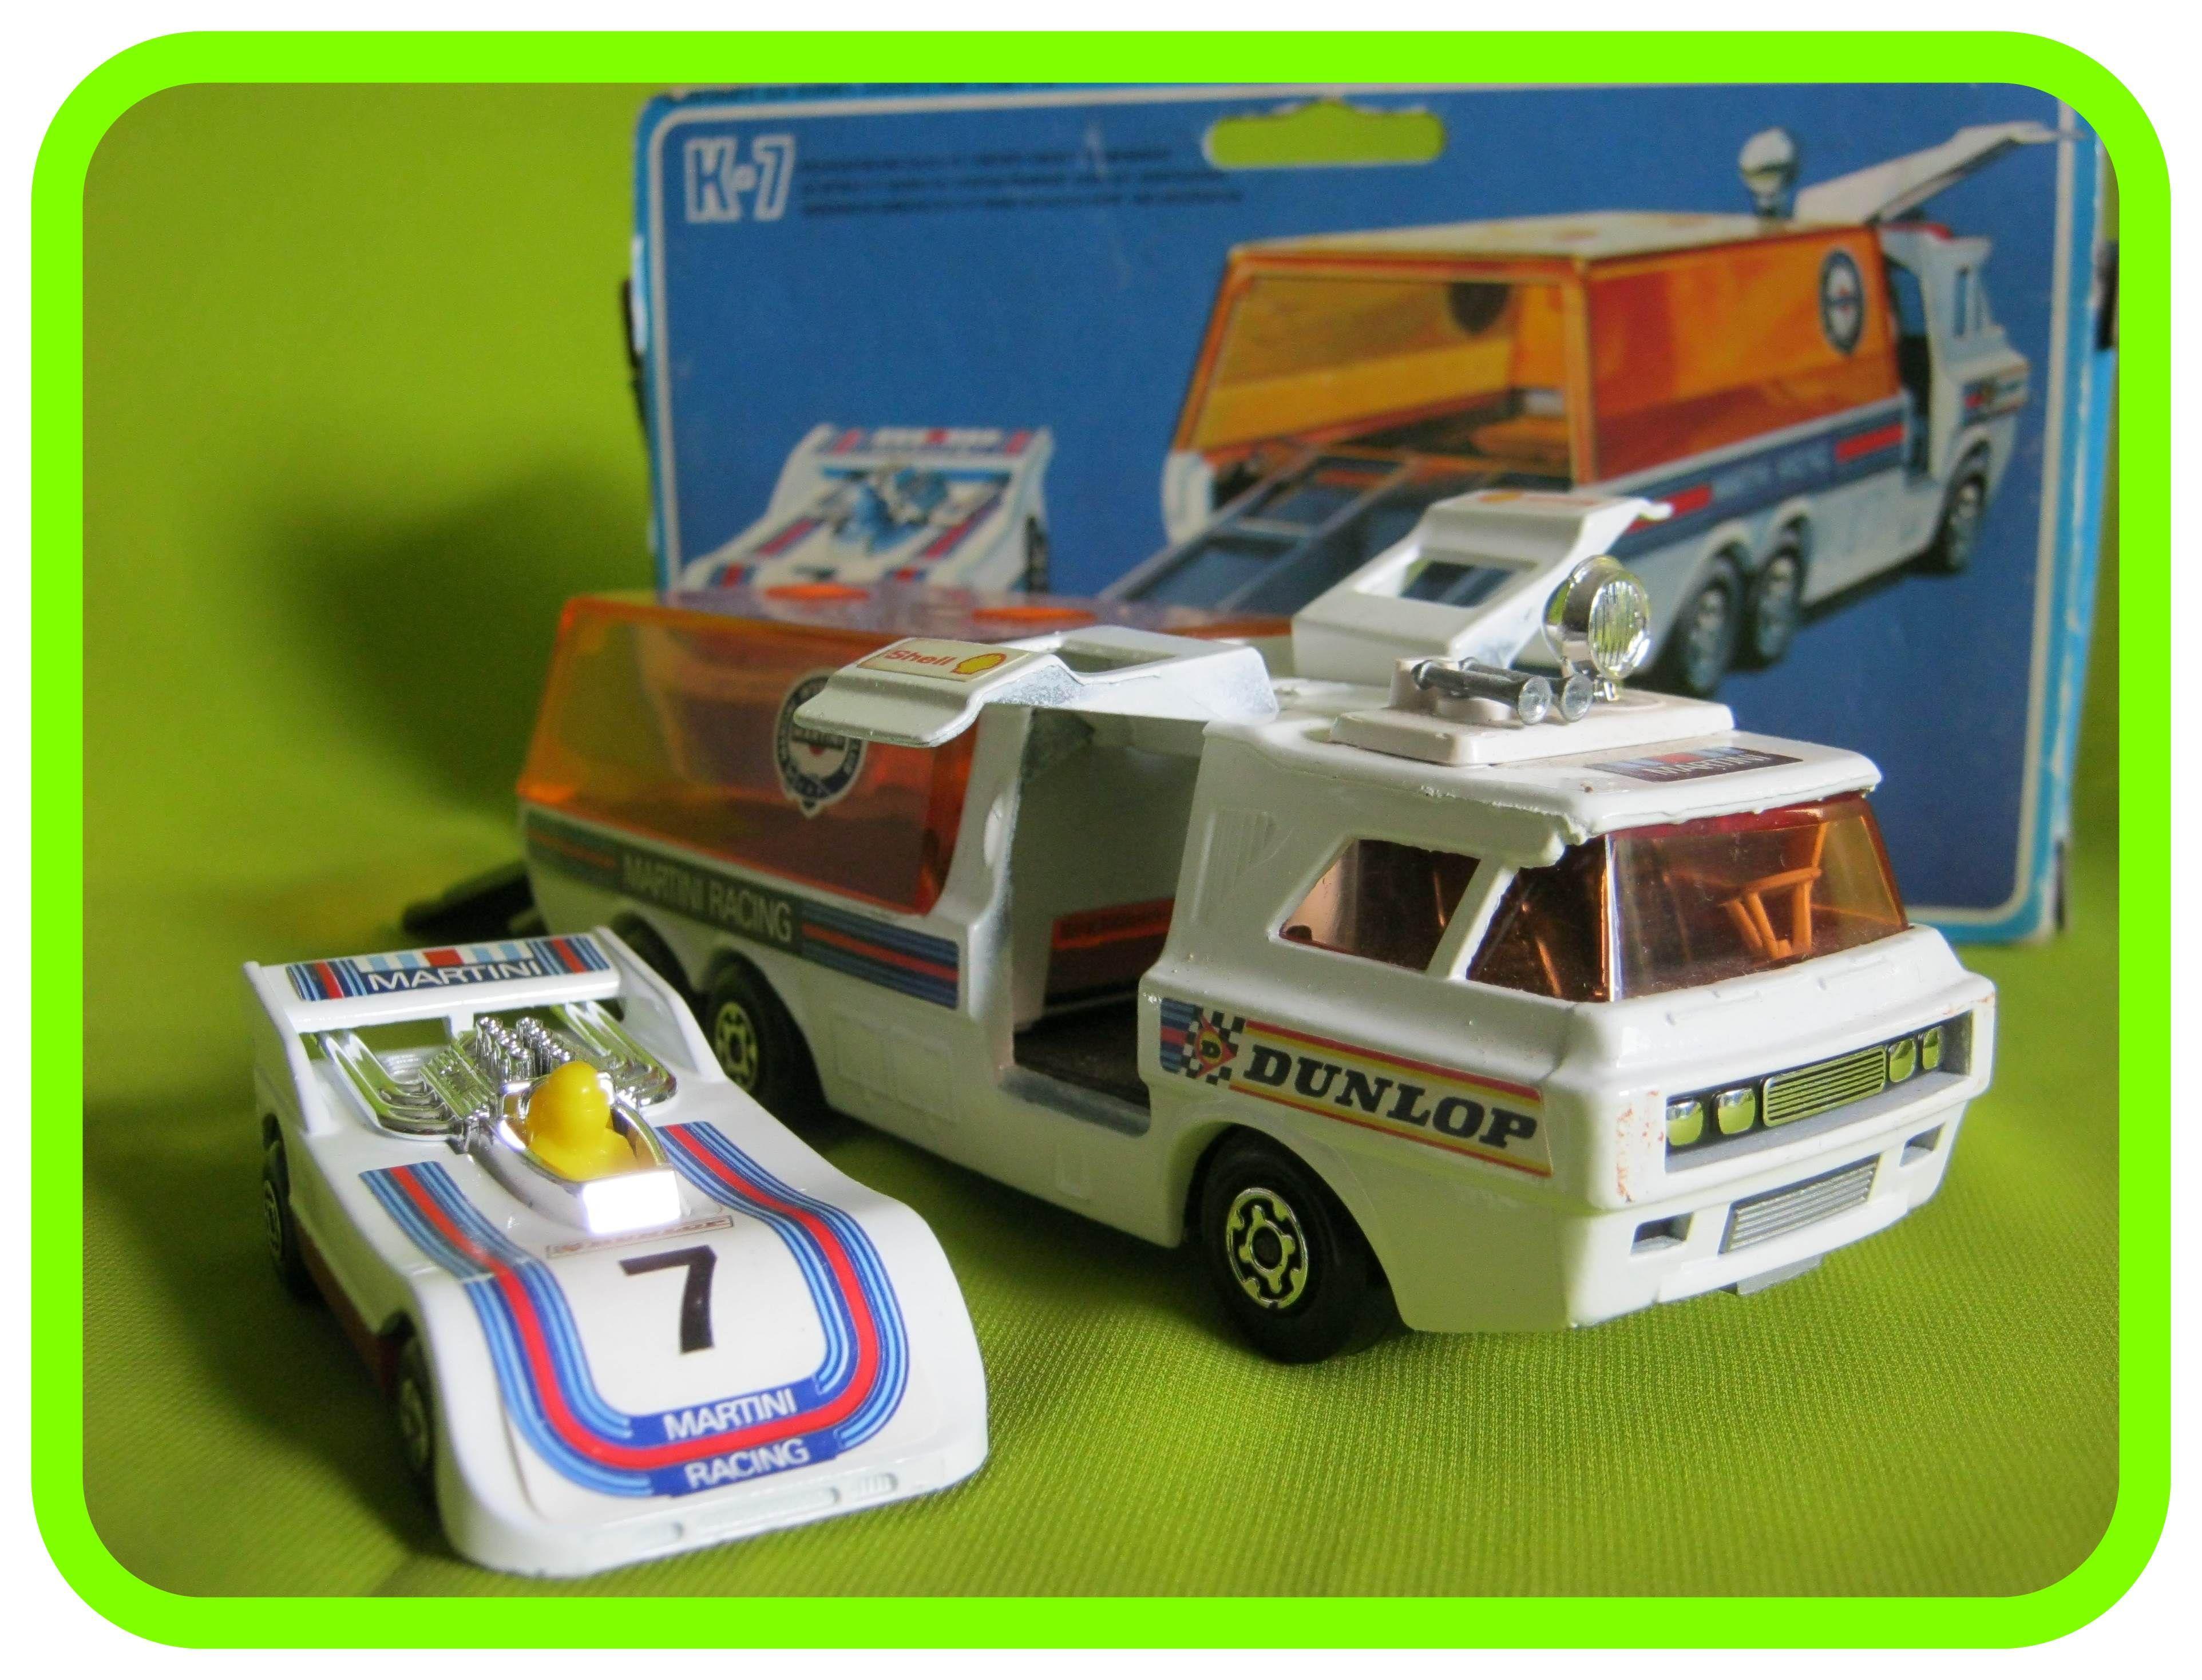 K7 Racing Car Transporter Martini Version With Hi Tailer Racing Car Badged 7 Mattel Hot Wheels Toy Car Vintage Toys